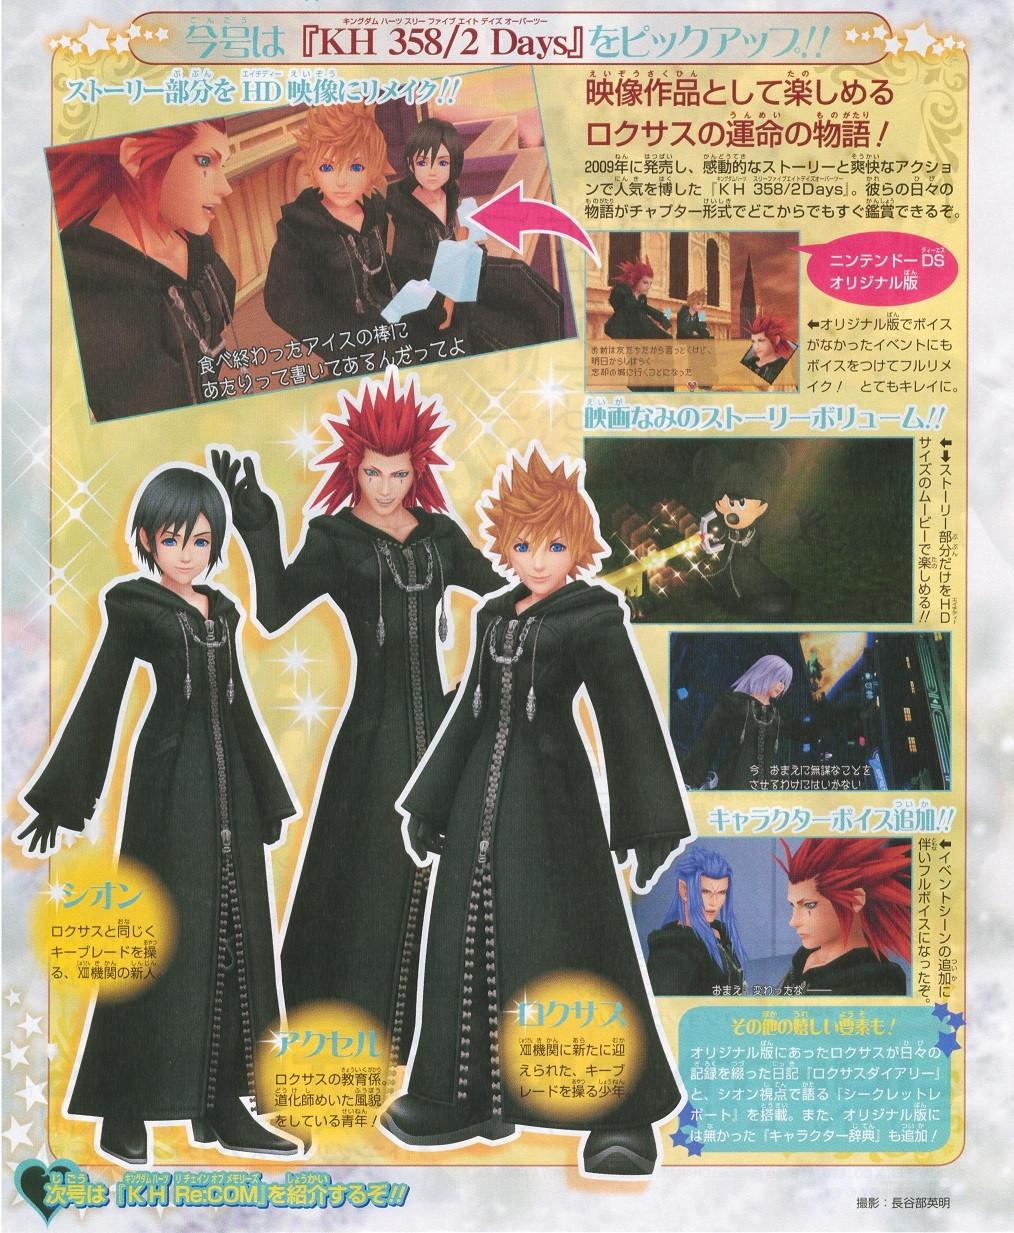 Tujisaki Kingdom Hearts 358 2 Days Kingdom Hearts Ii: KINGDOM HEARTS HD 1.5 ReMIX Scan From V Jump!